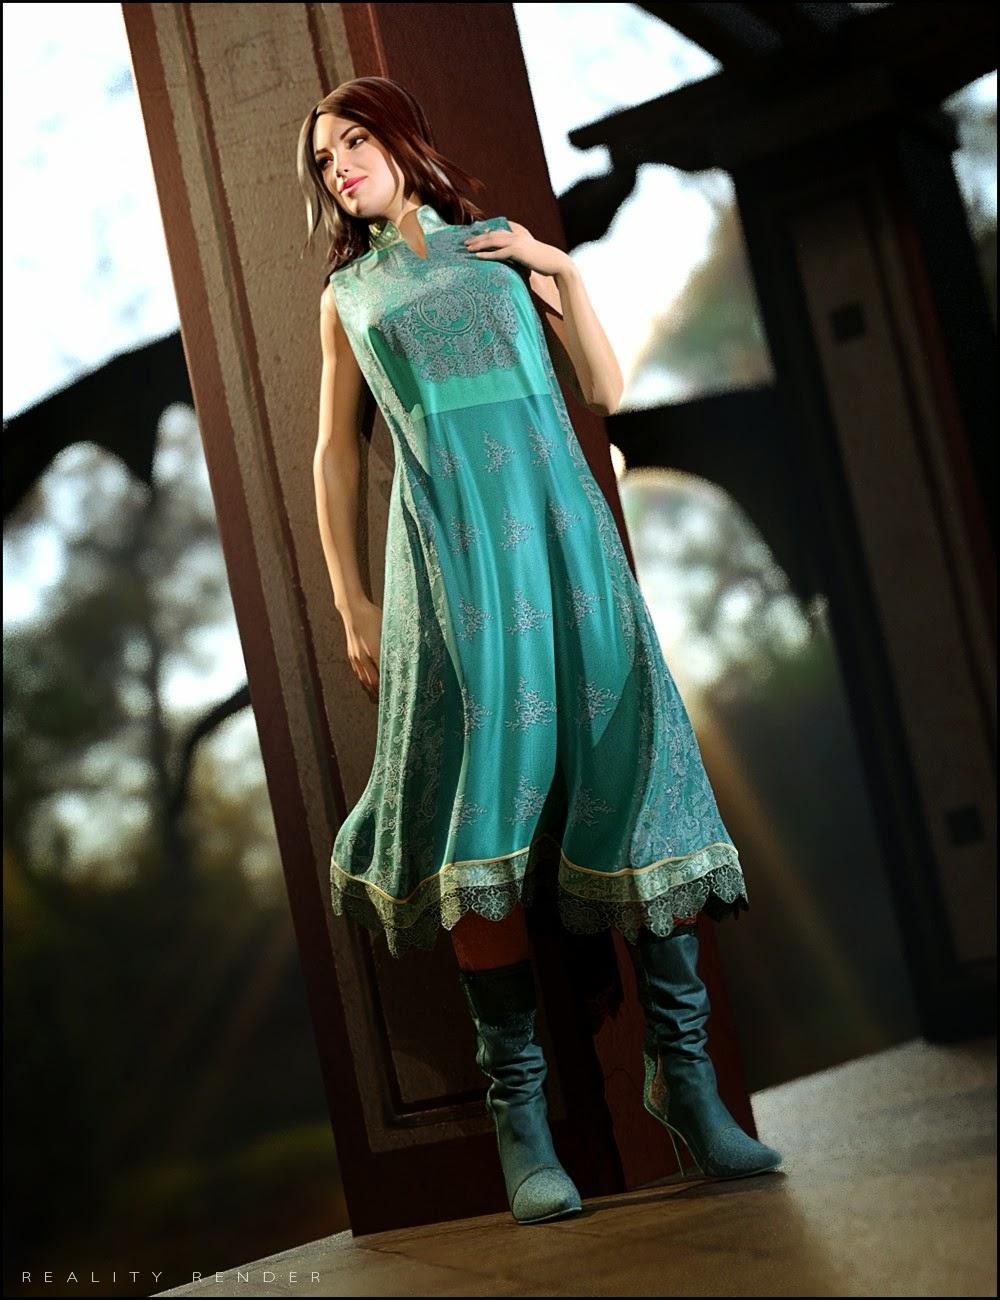 Hautes Jardin Outfit Textures